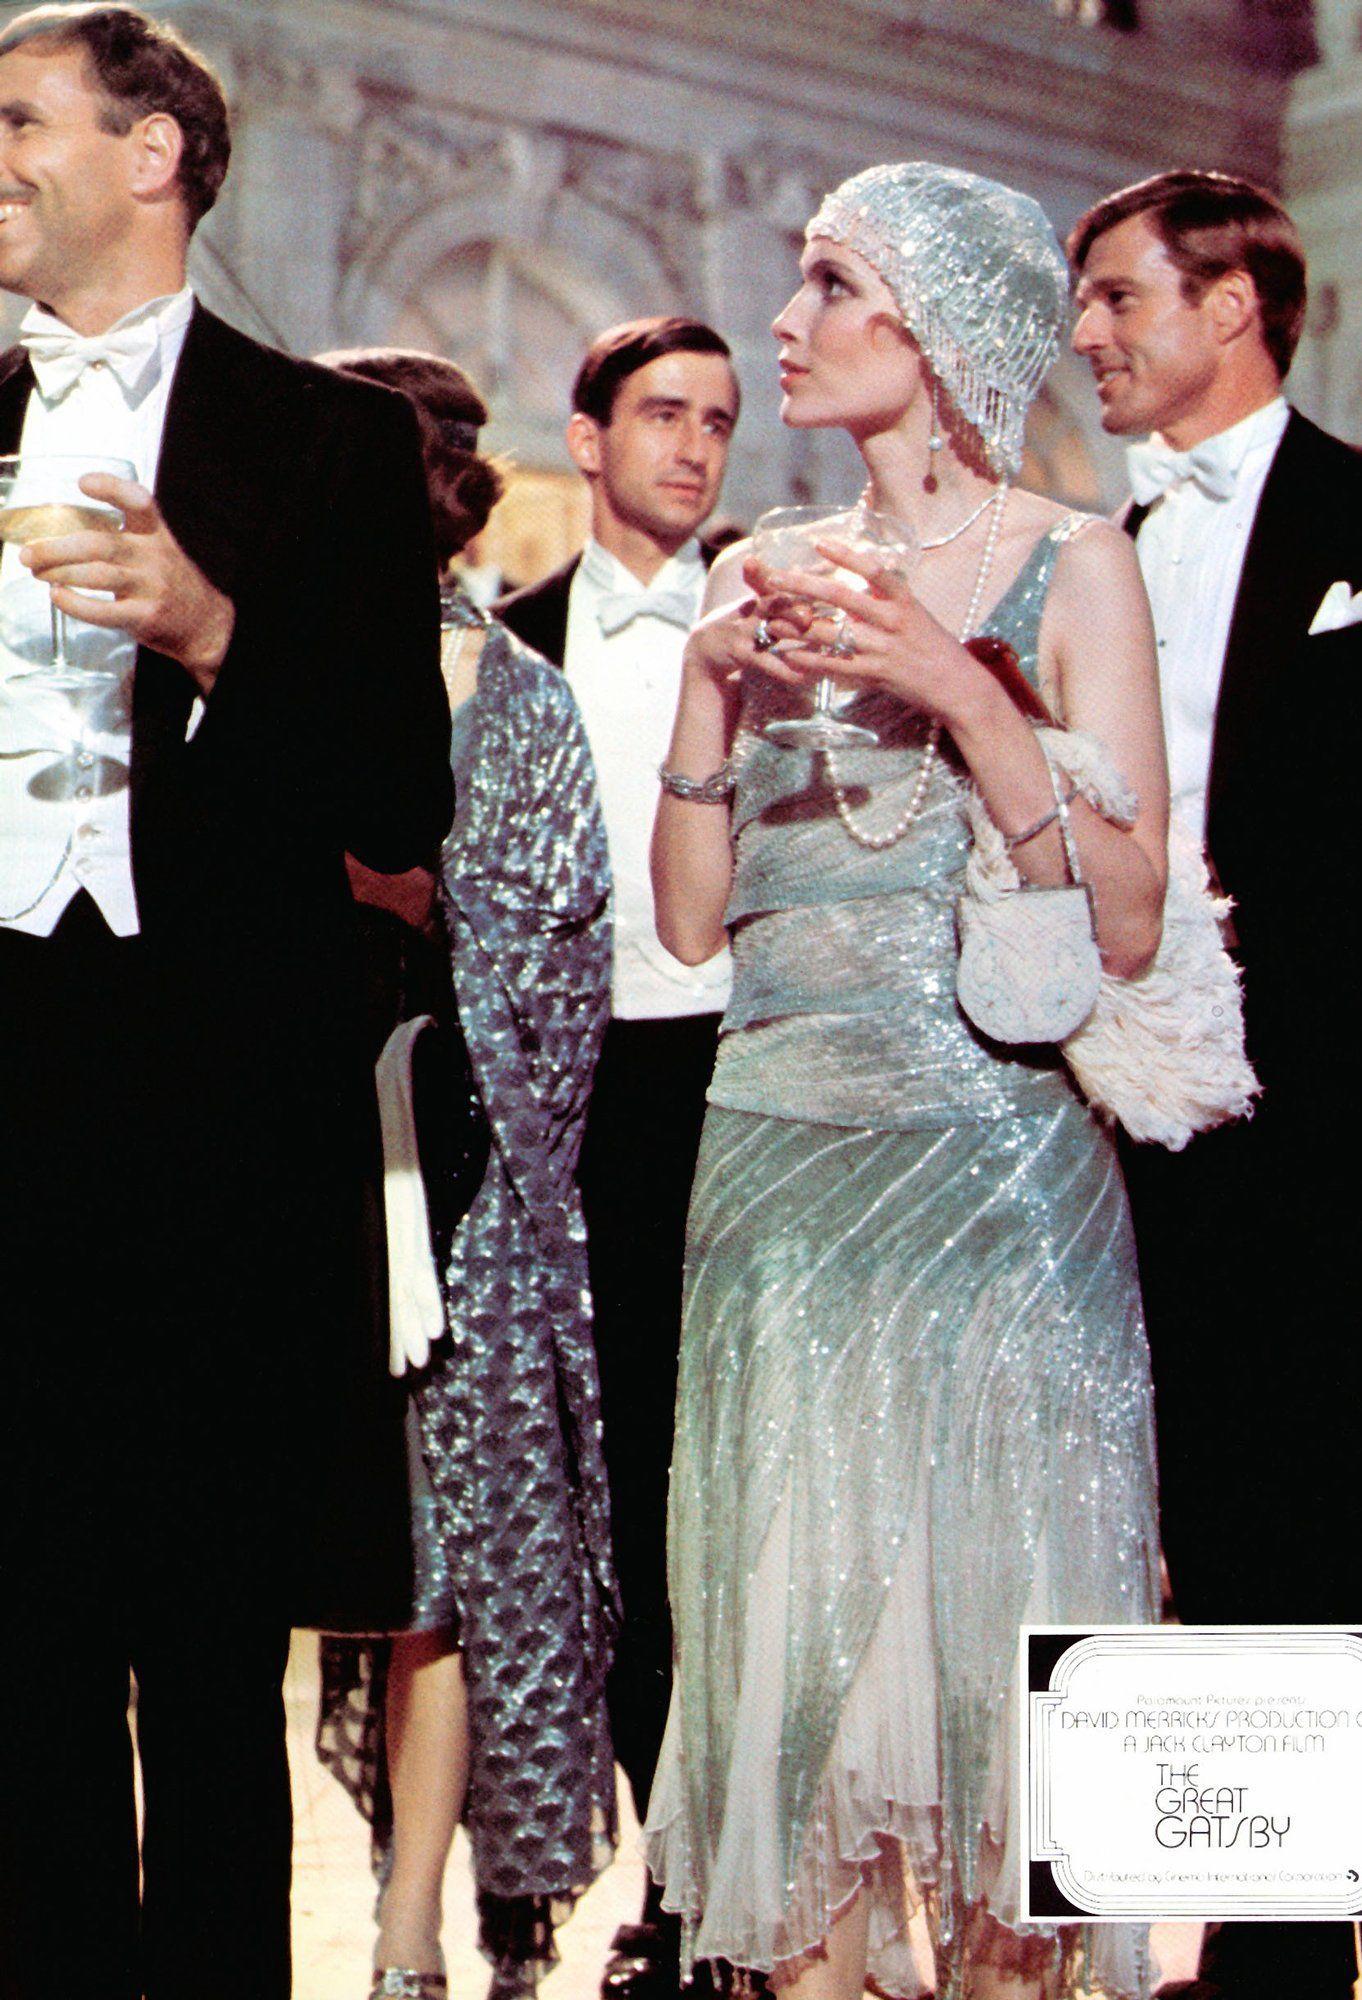 The Great Gatsby 1974 mia farrow - Google Search | Great gatsby fashion,  Iconic dresses, Gatsby party dress